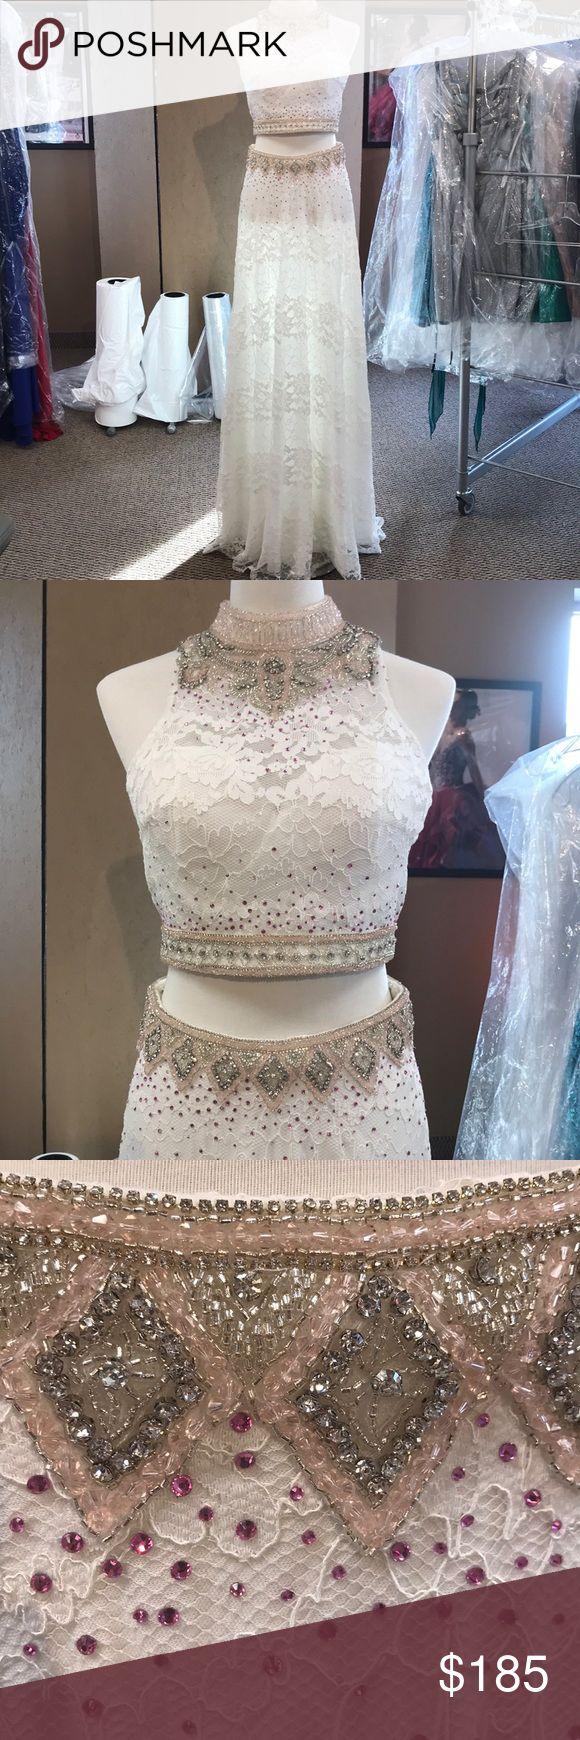 Vienna Prom Size 8 Two Piece Piece Prom Dress Prom Prom Dresses [ 1740 x 580 Pixel ]